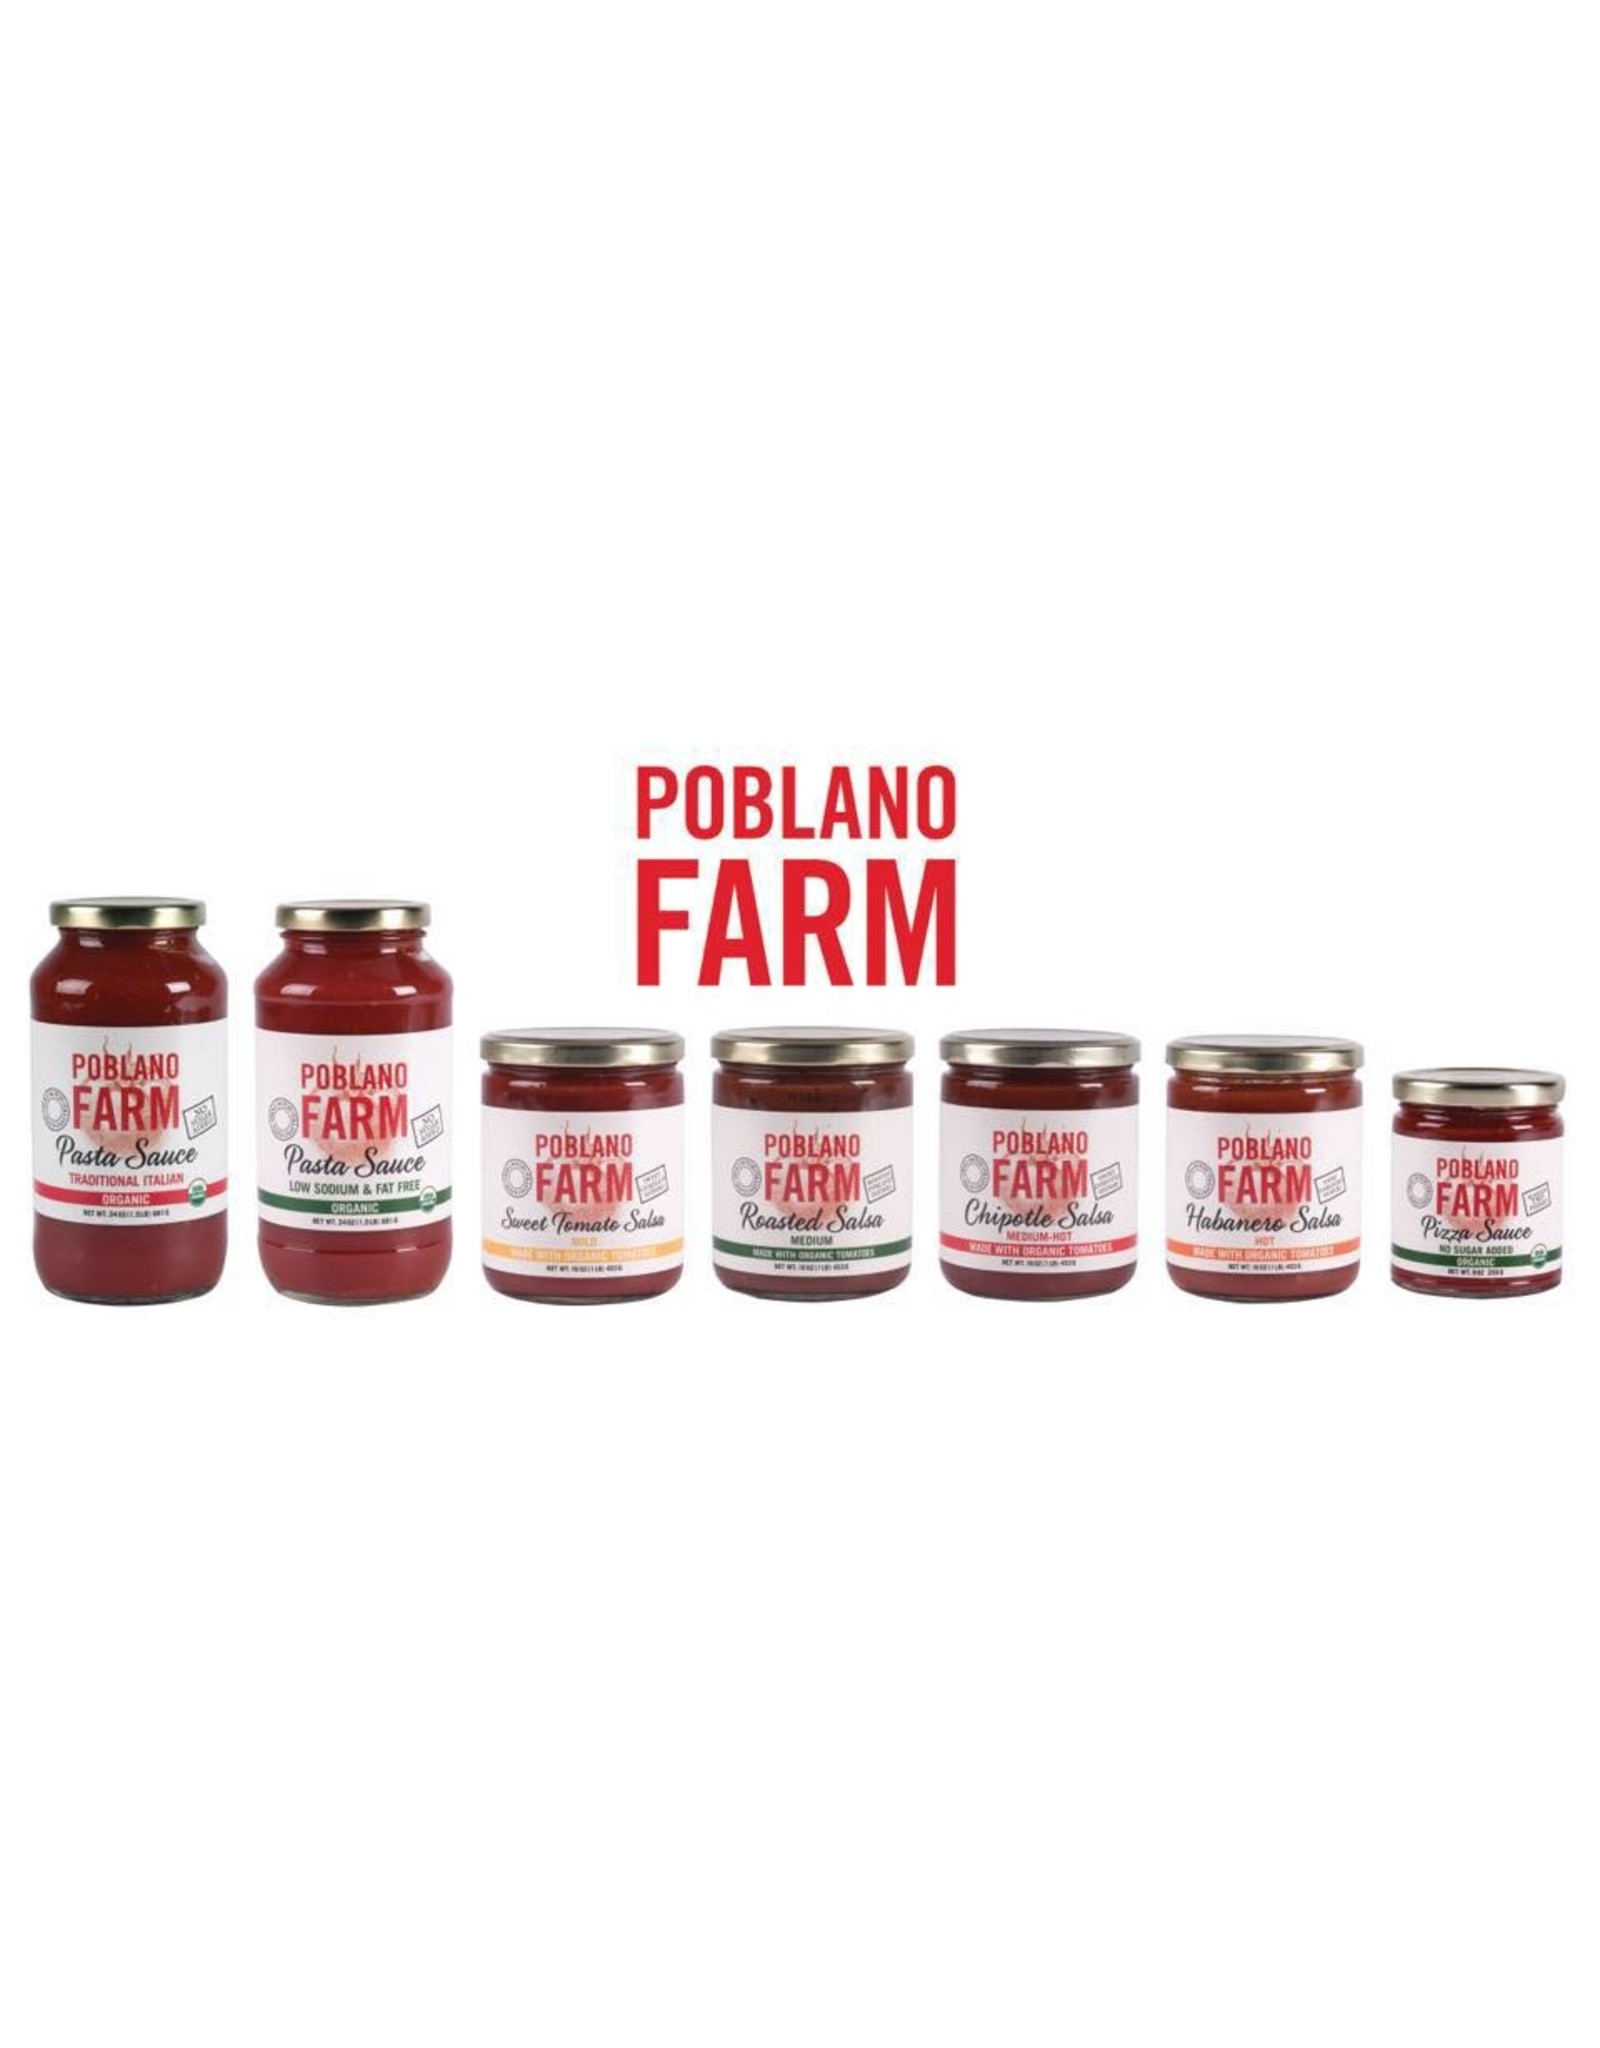 Poblano Farm Poblano Farm Chipotle Salsa (Medium Hot)